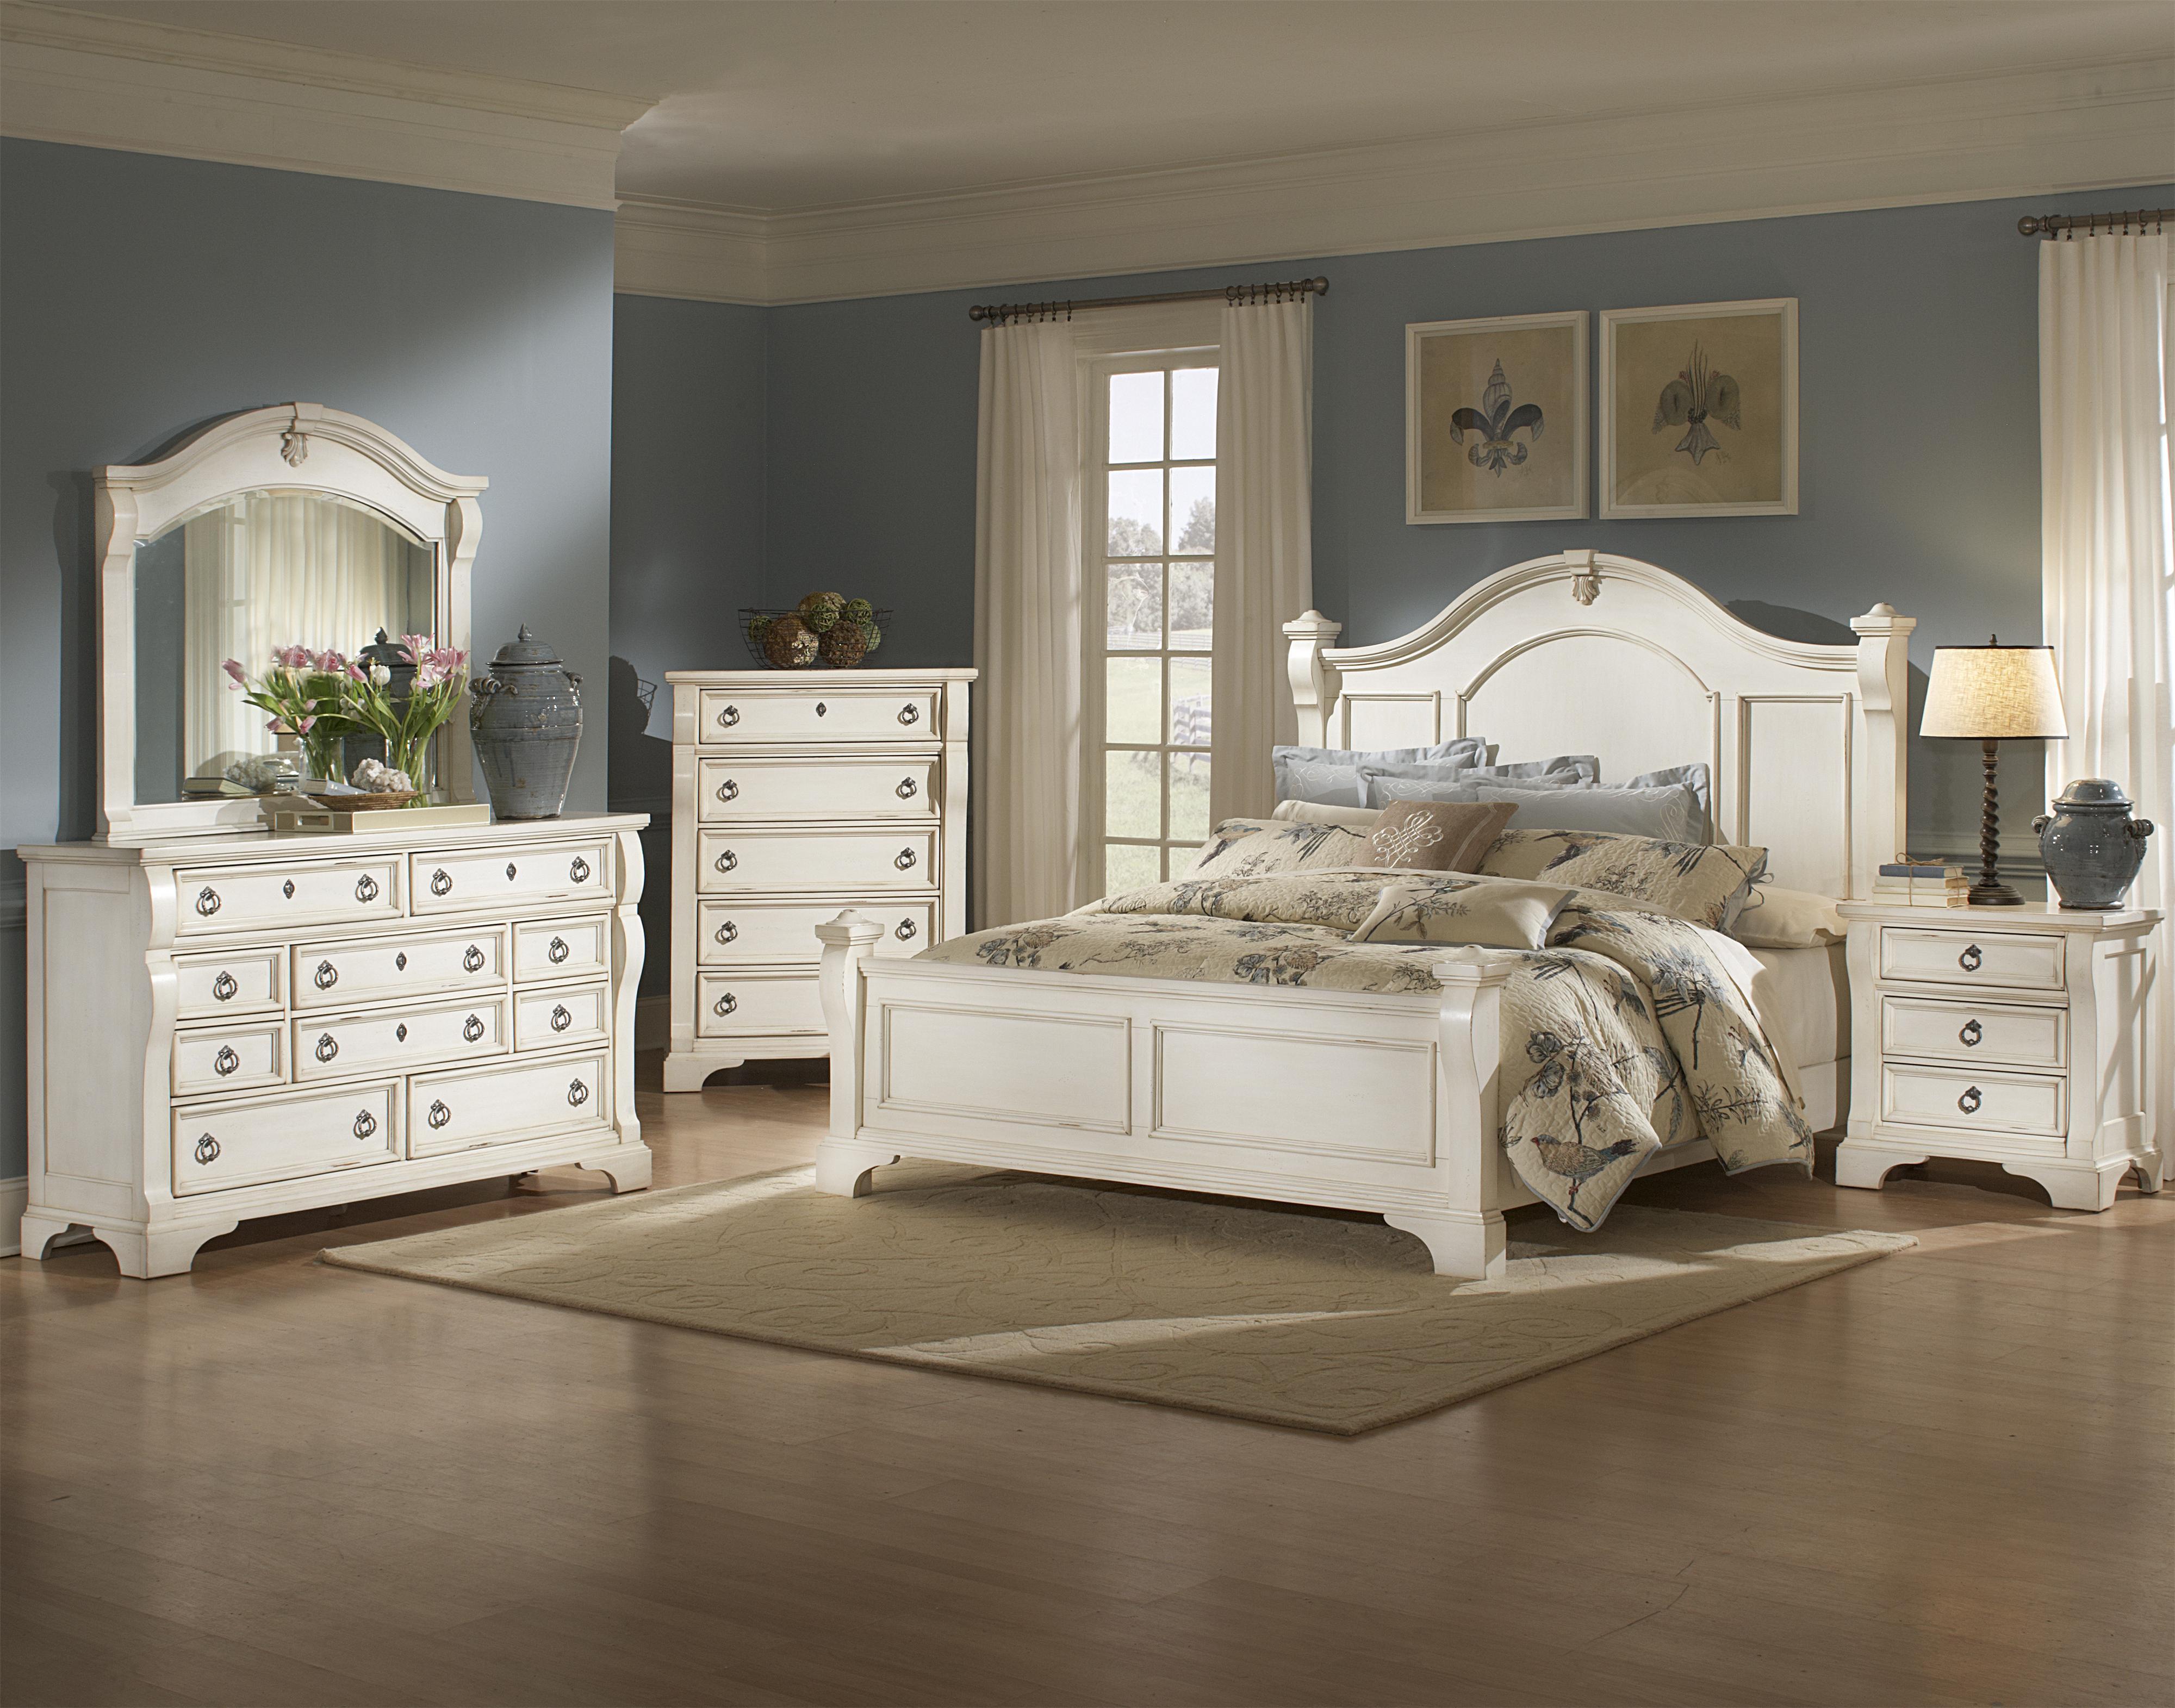 American Woodcrafters Heirloom Queen Bedroom Group - Item Number: 2910 Q Bedroom Group 1